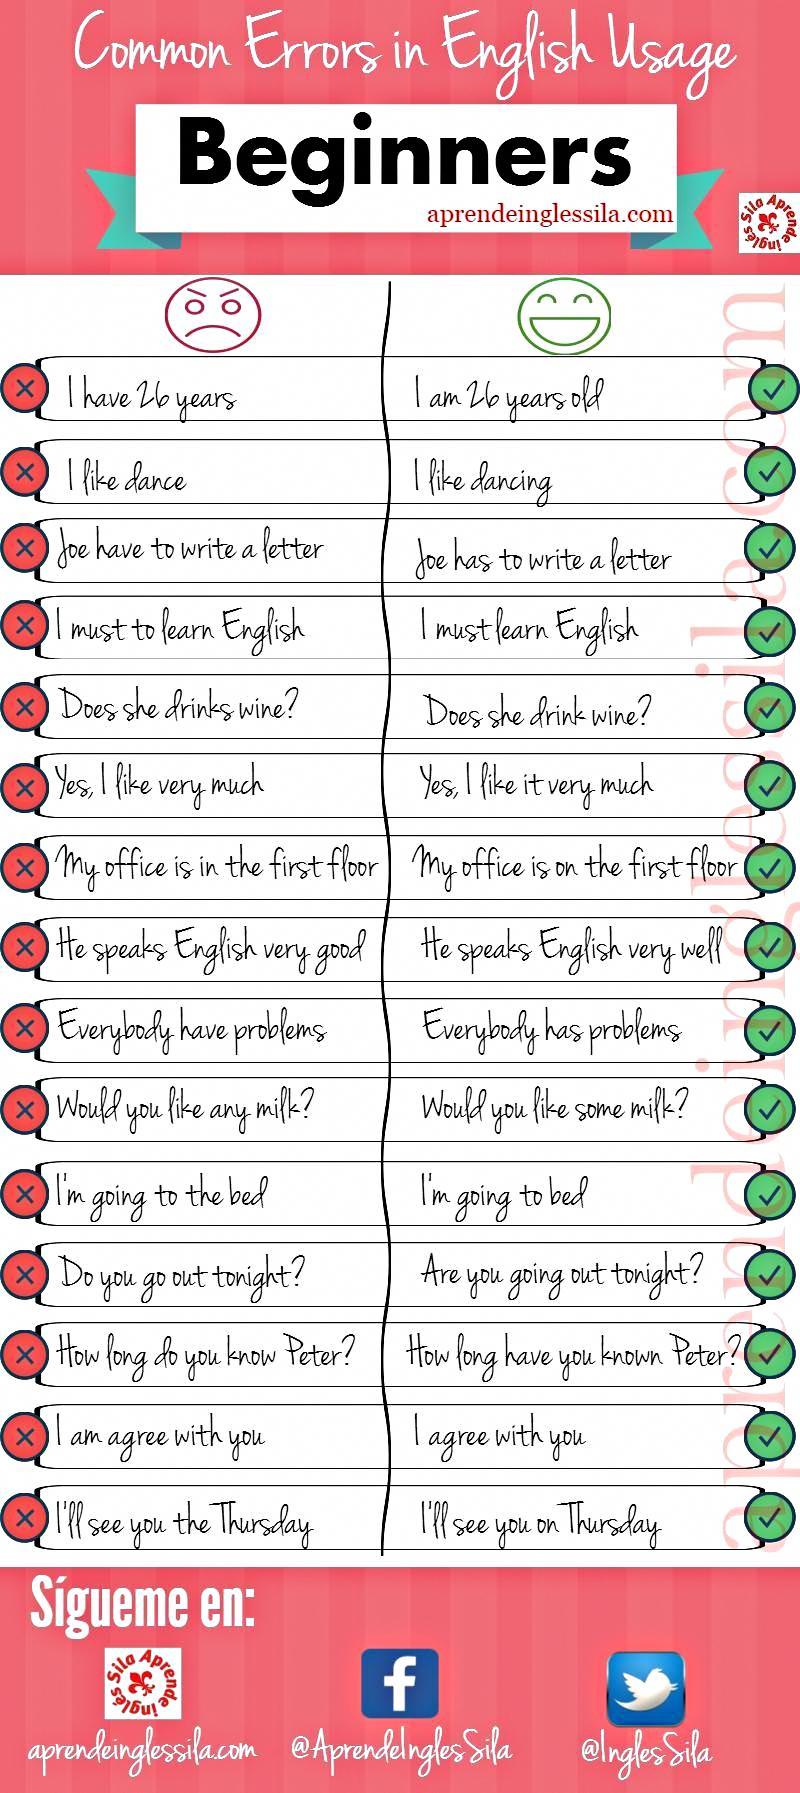 Common Errors In English Beginners Aprende Inglés Sila Apprendreanglais Apprendreanglaisen English Language Learning Learn English English Language Teaching